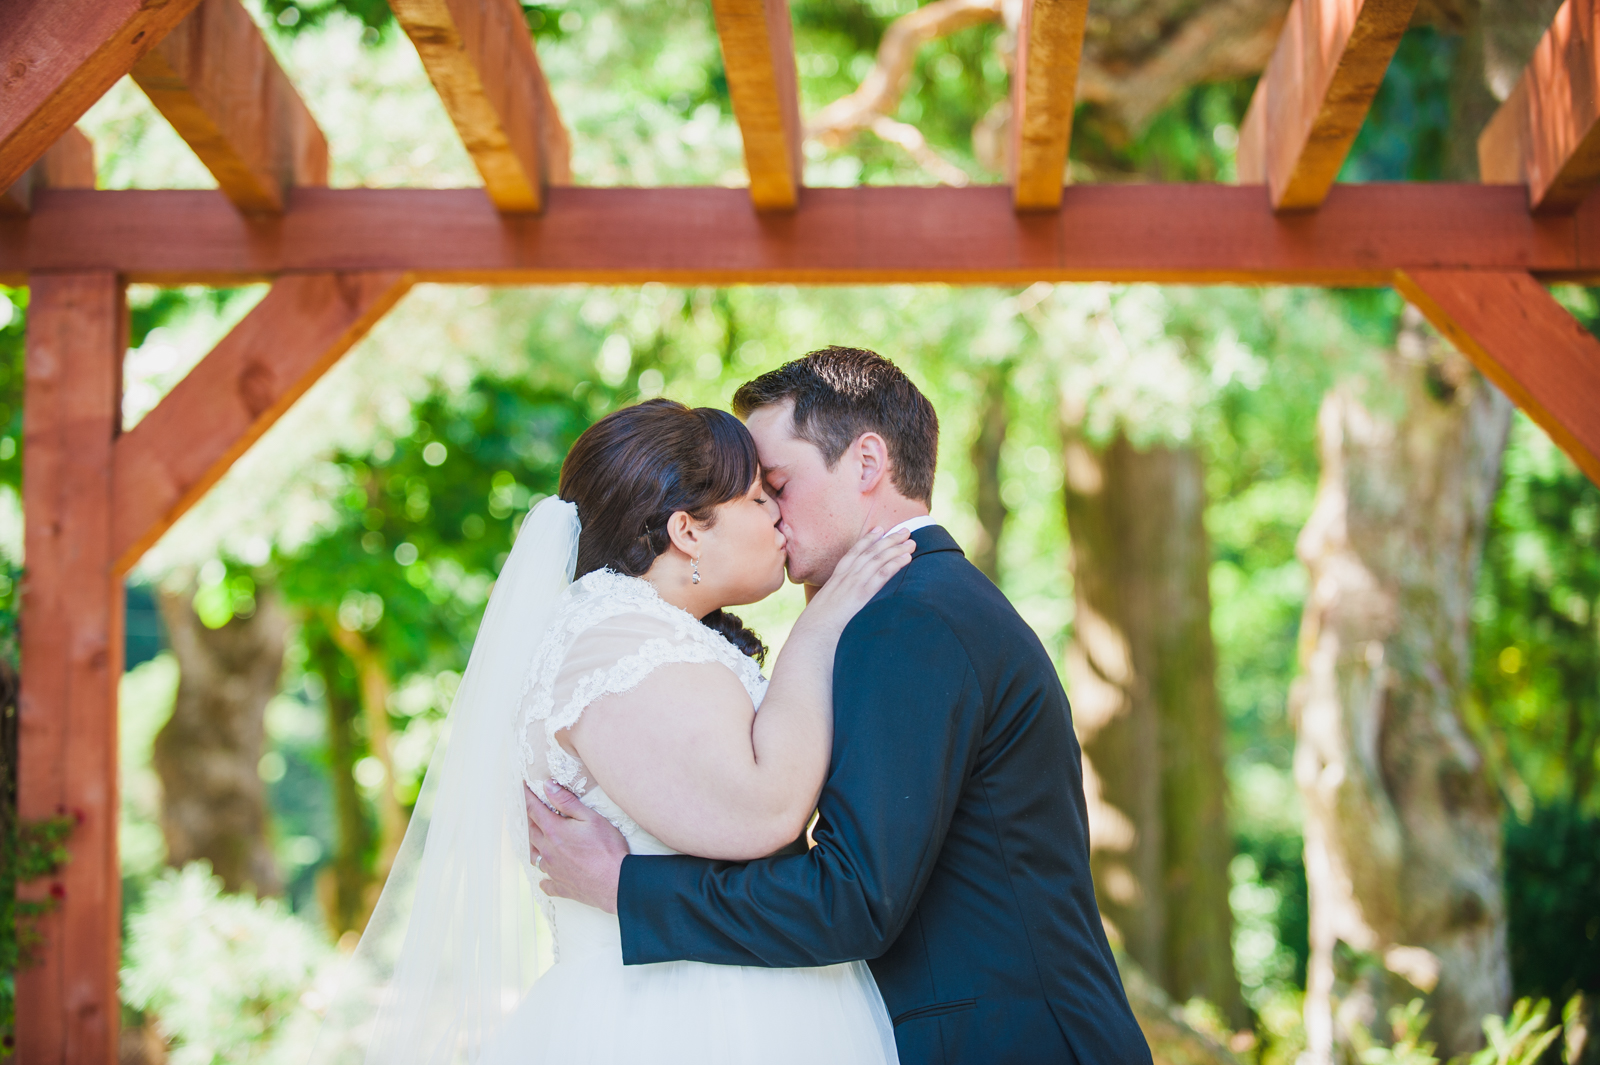 bc-wedding-photographers-harrison-lake-wedding-28.jpg